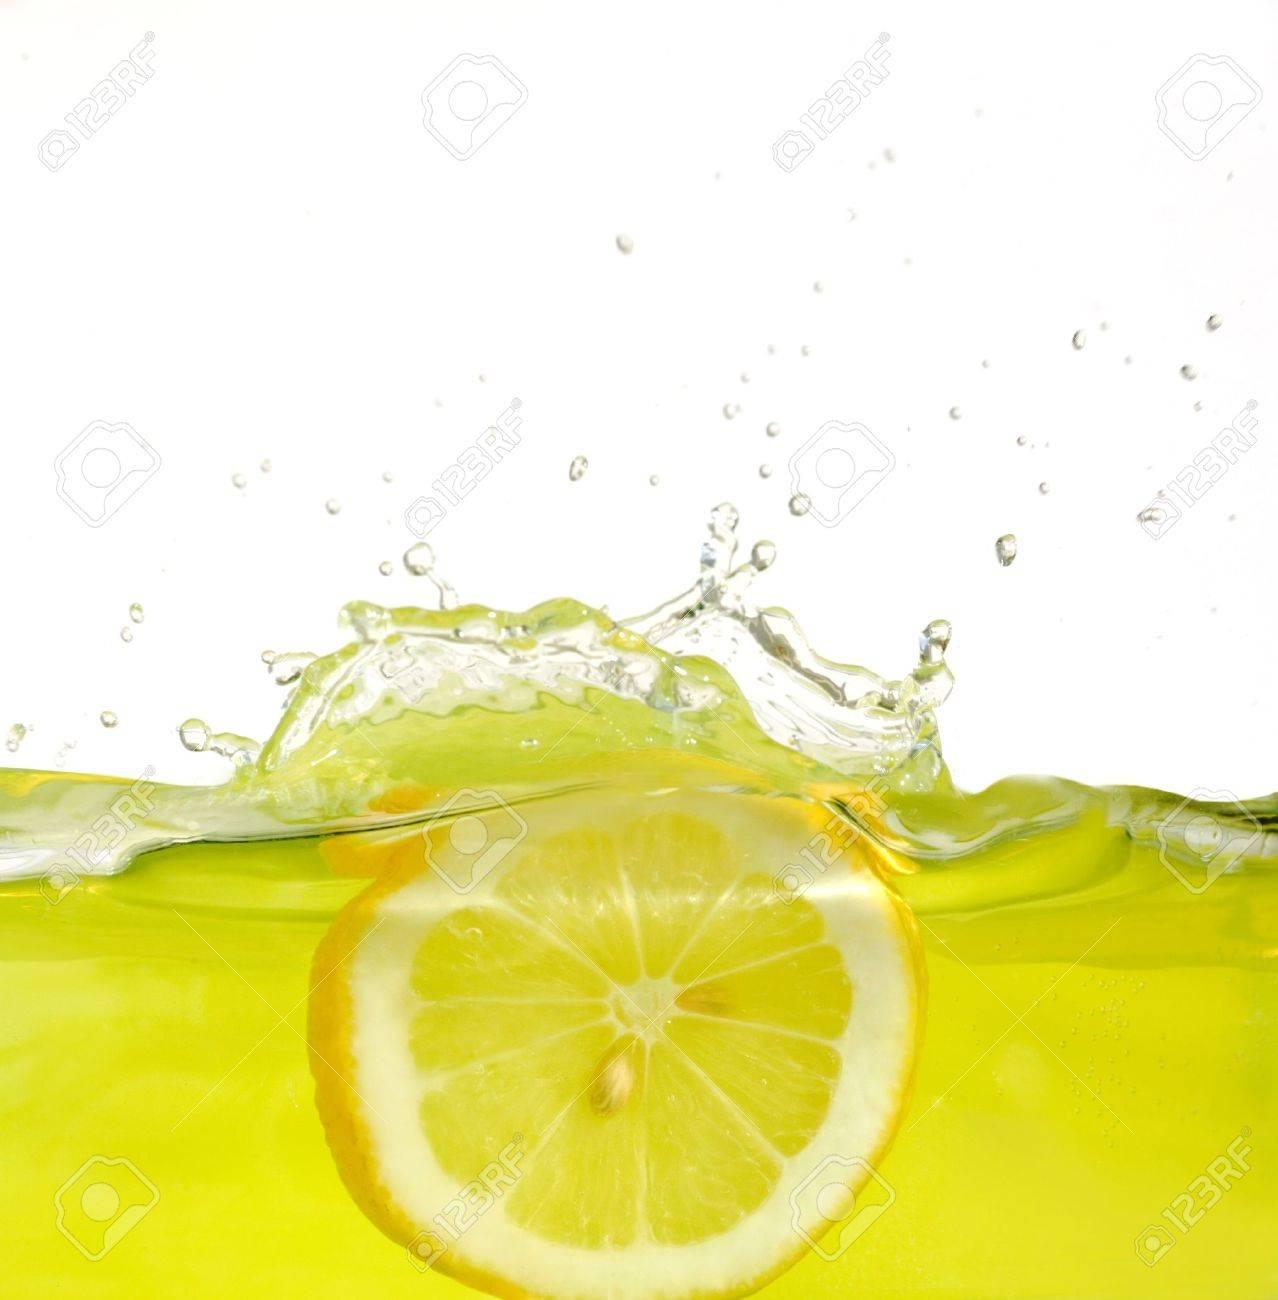 Green Lemon Water Splash Hd Wallpaper